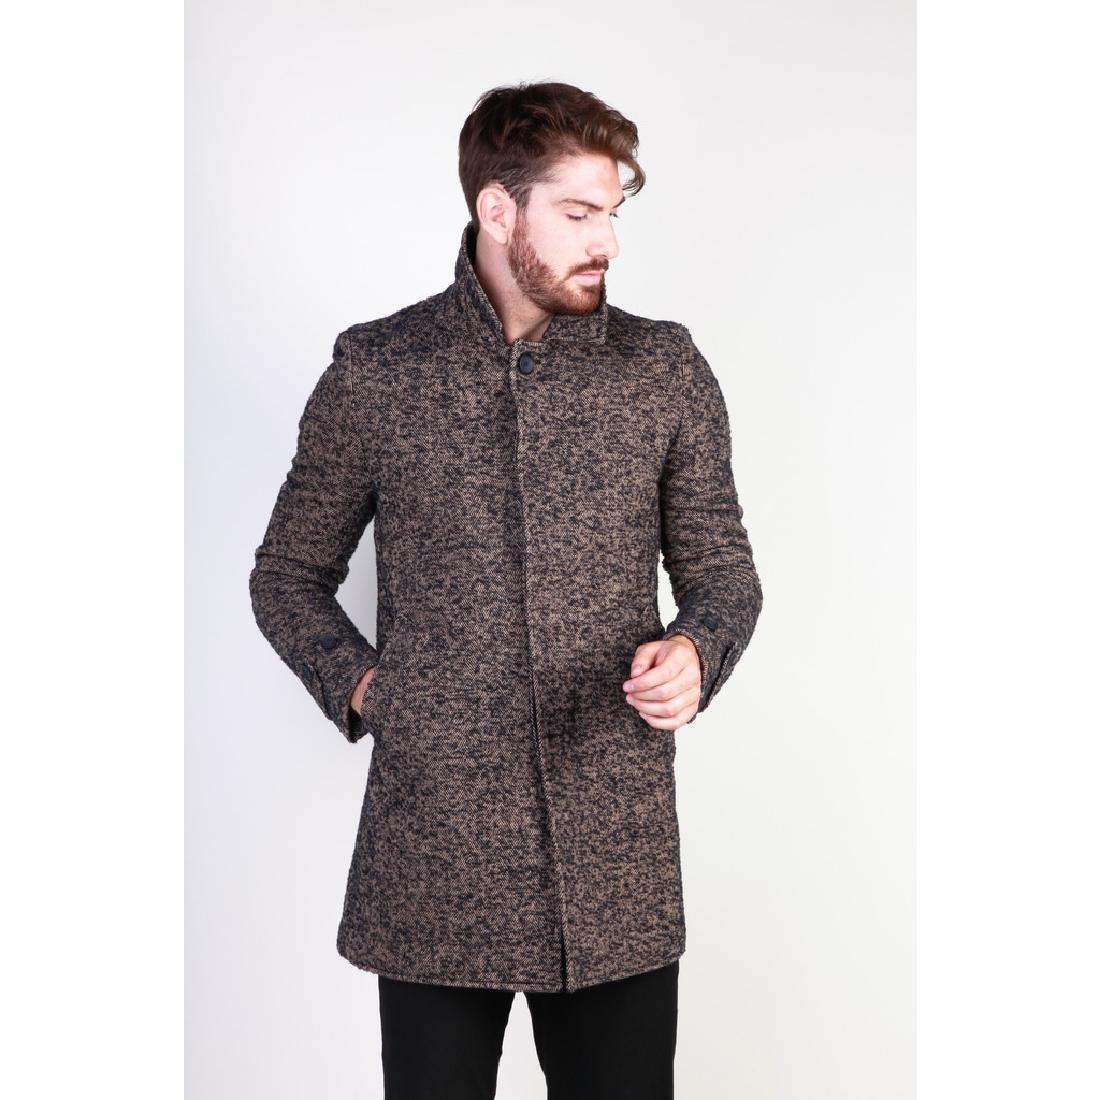 New Men's Italian Wool Blend Coat US 38 - 6